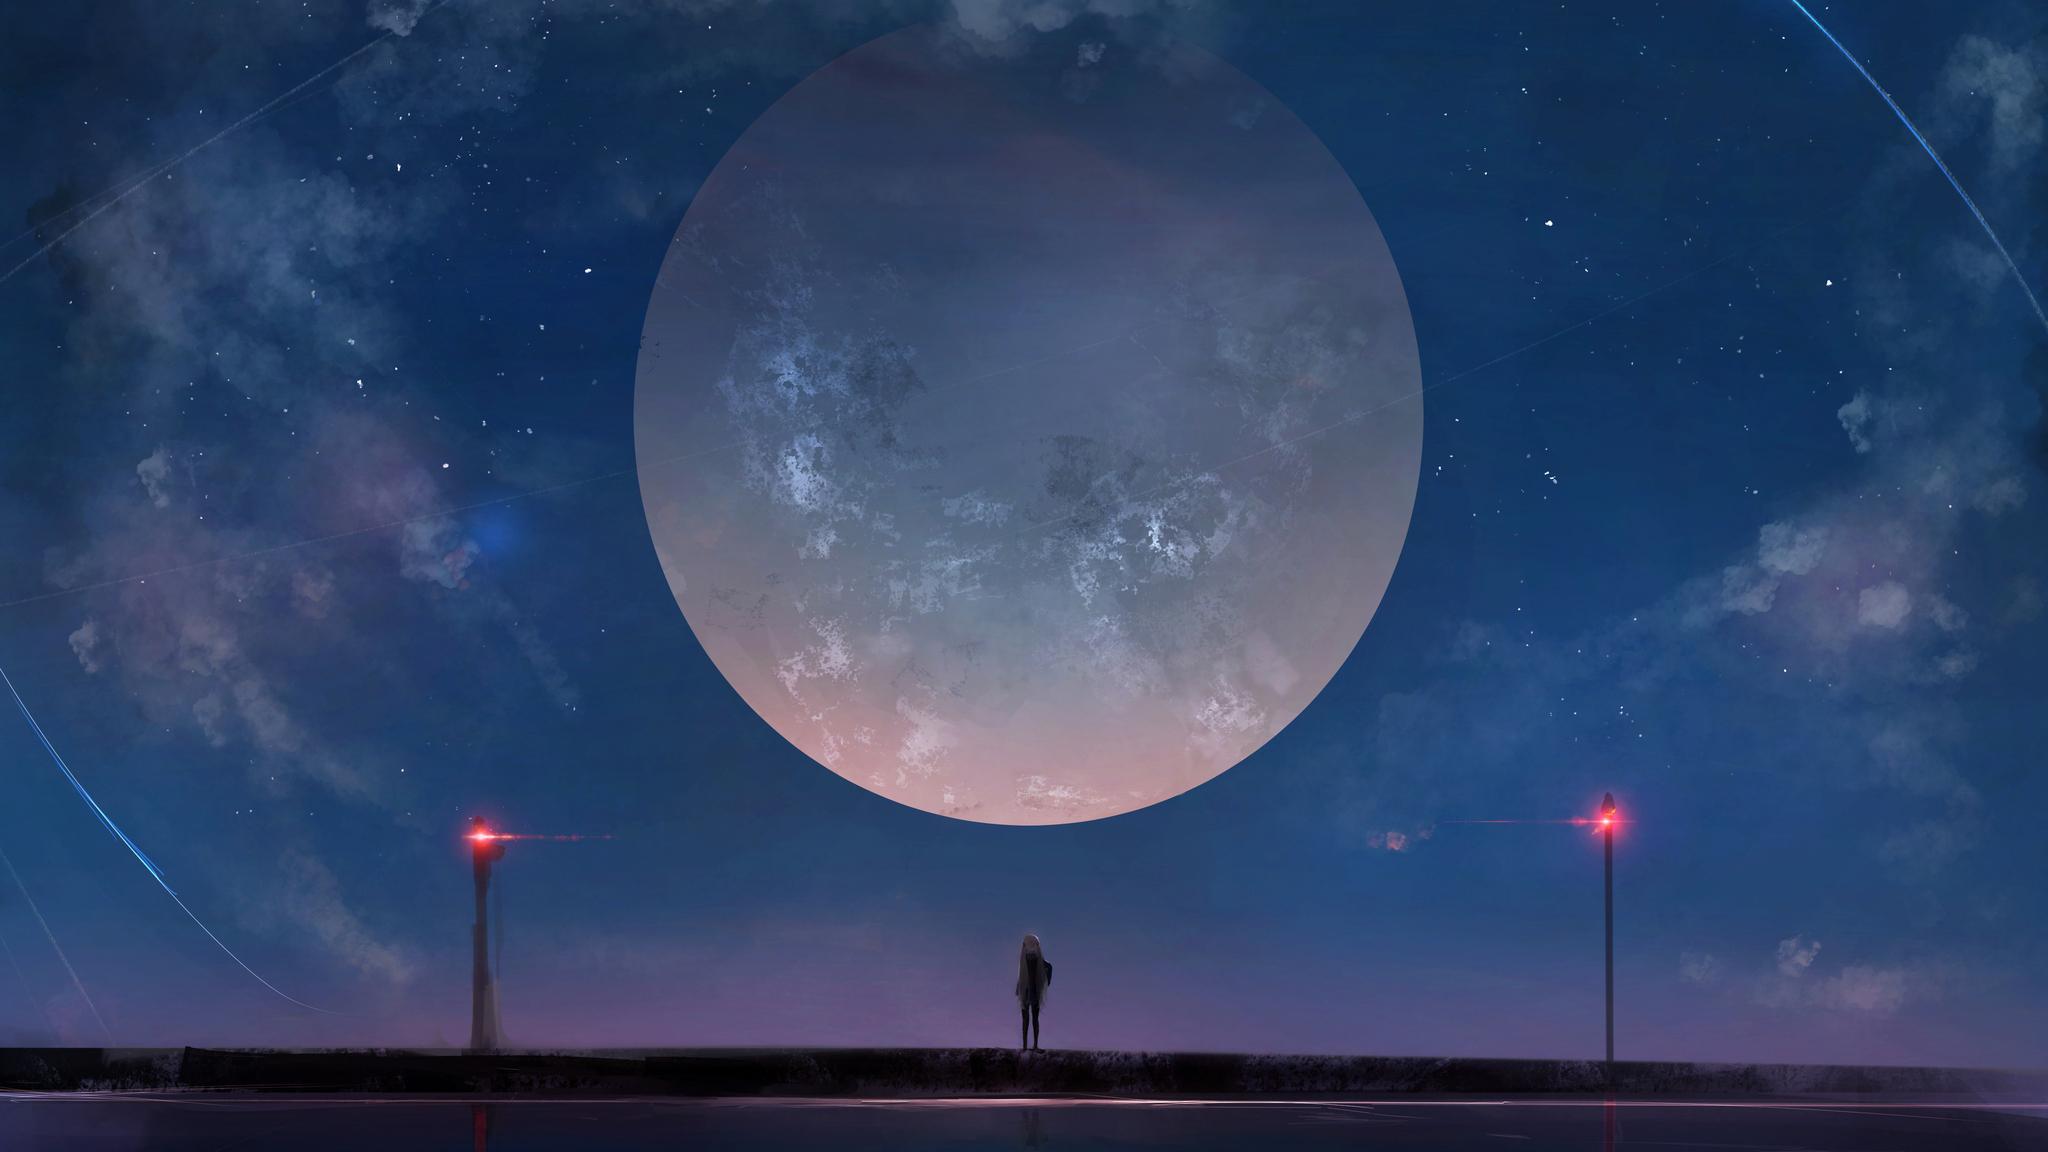 2048x1152 Huge Moon Anime Girl Night Sky Stars 2048x1152